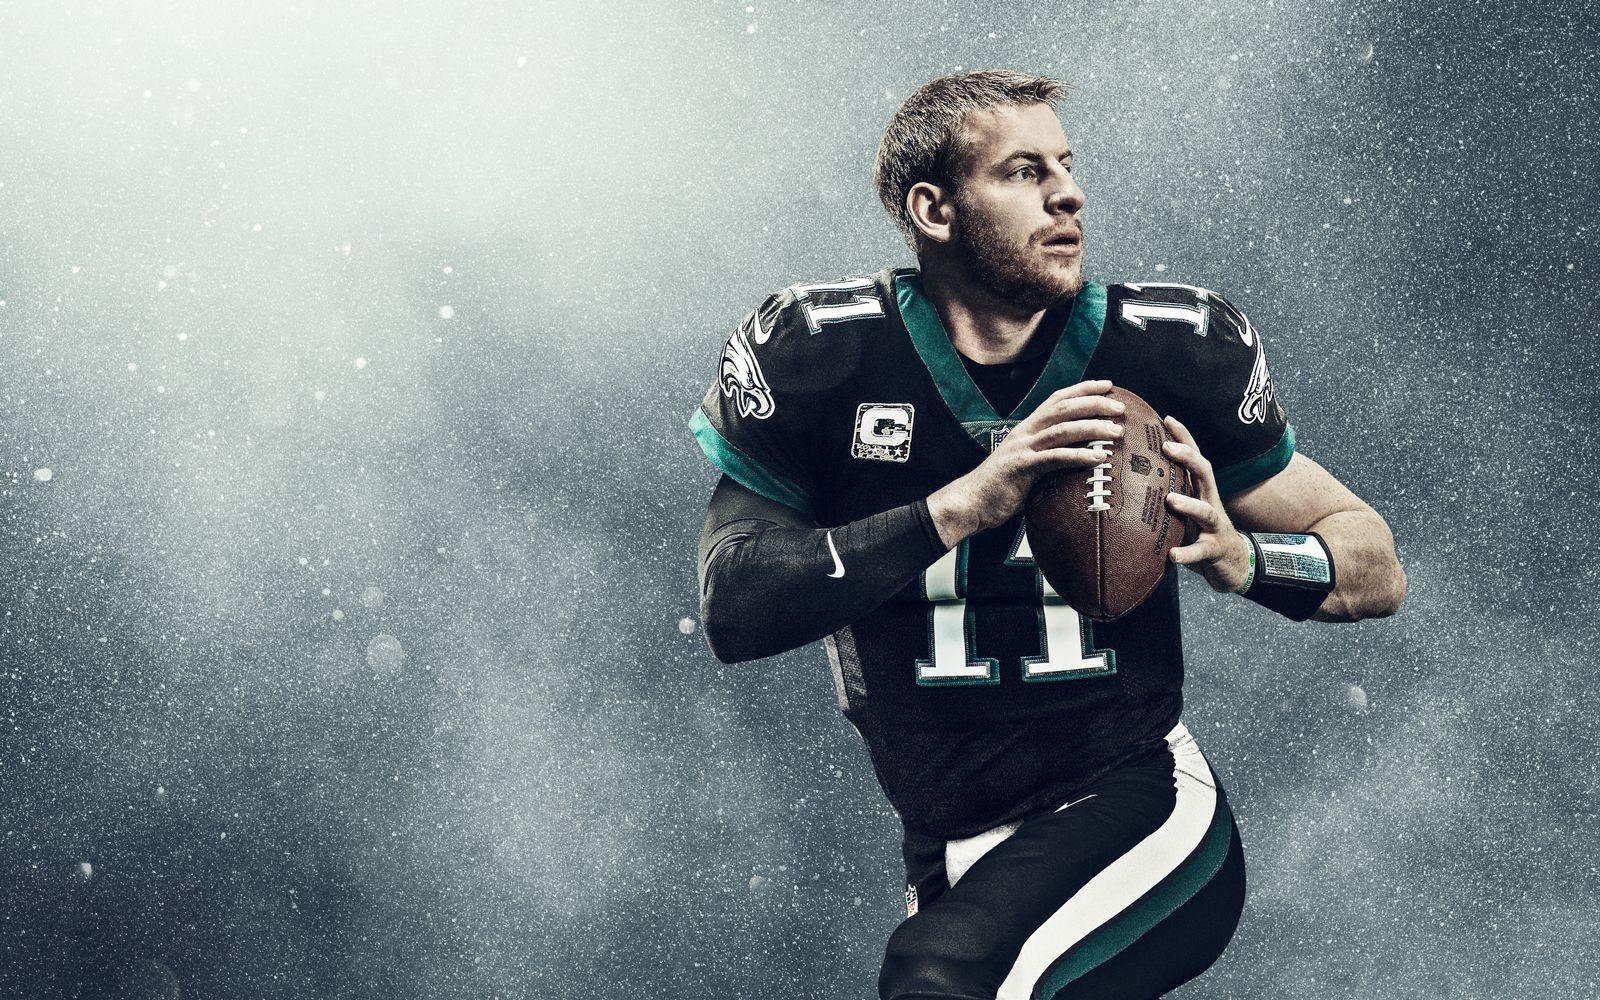 cheaper dc9ea 98622 Philadelphia Eagles quarterback Carson Wentz has fans ...